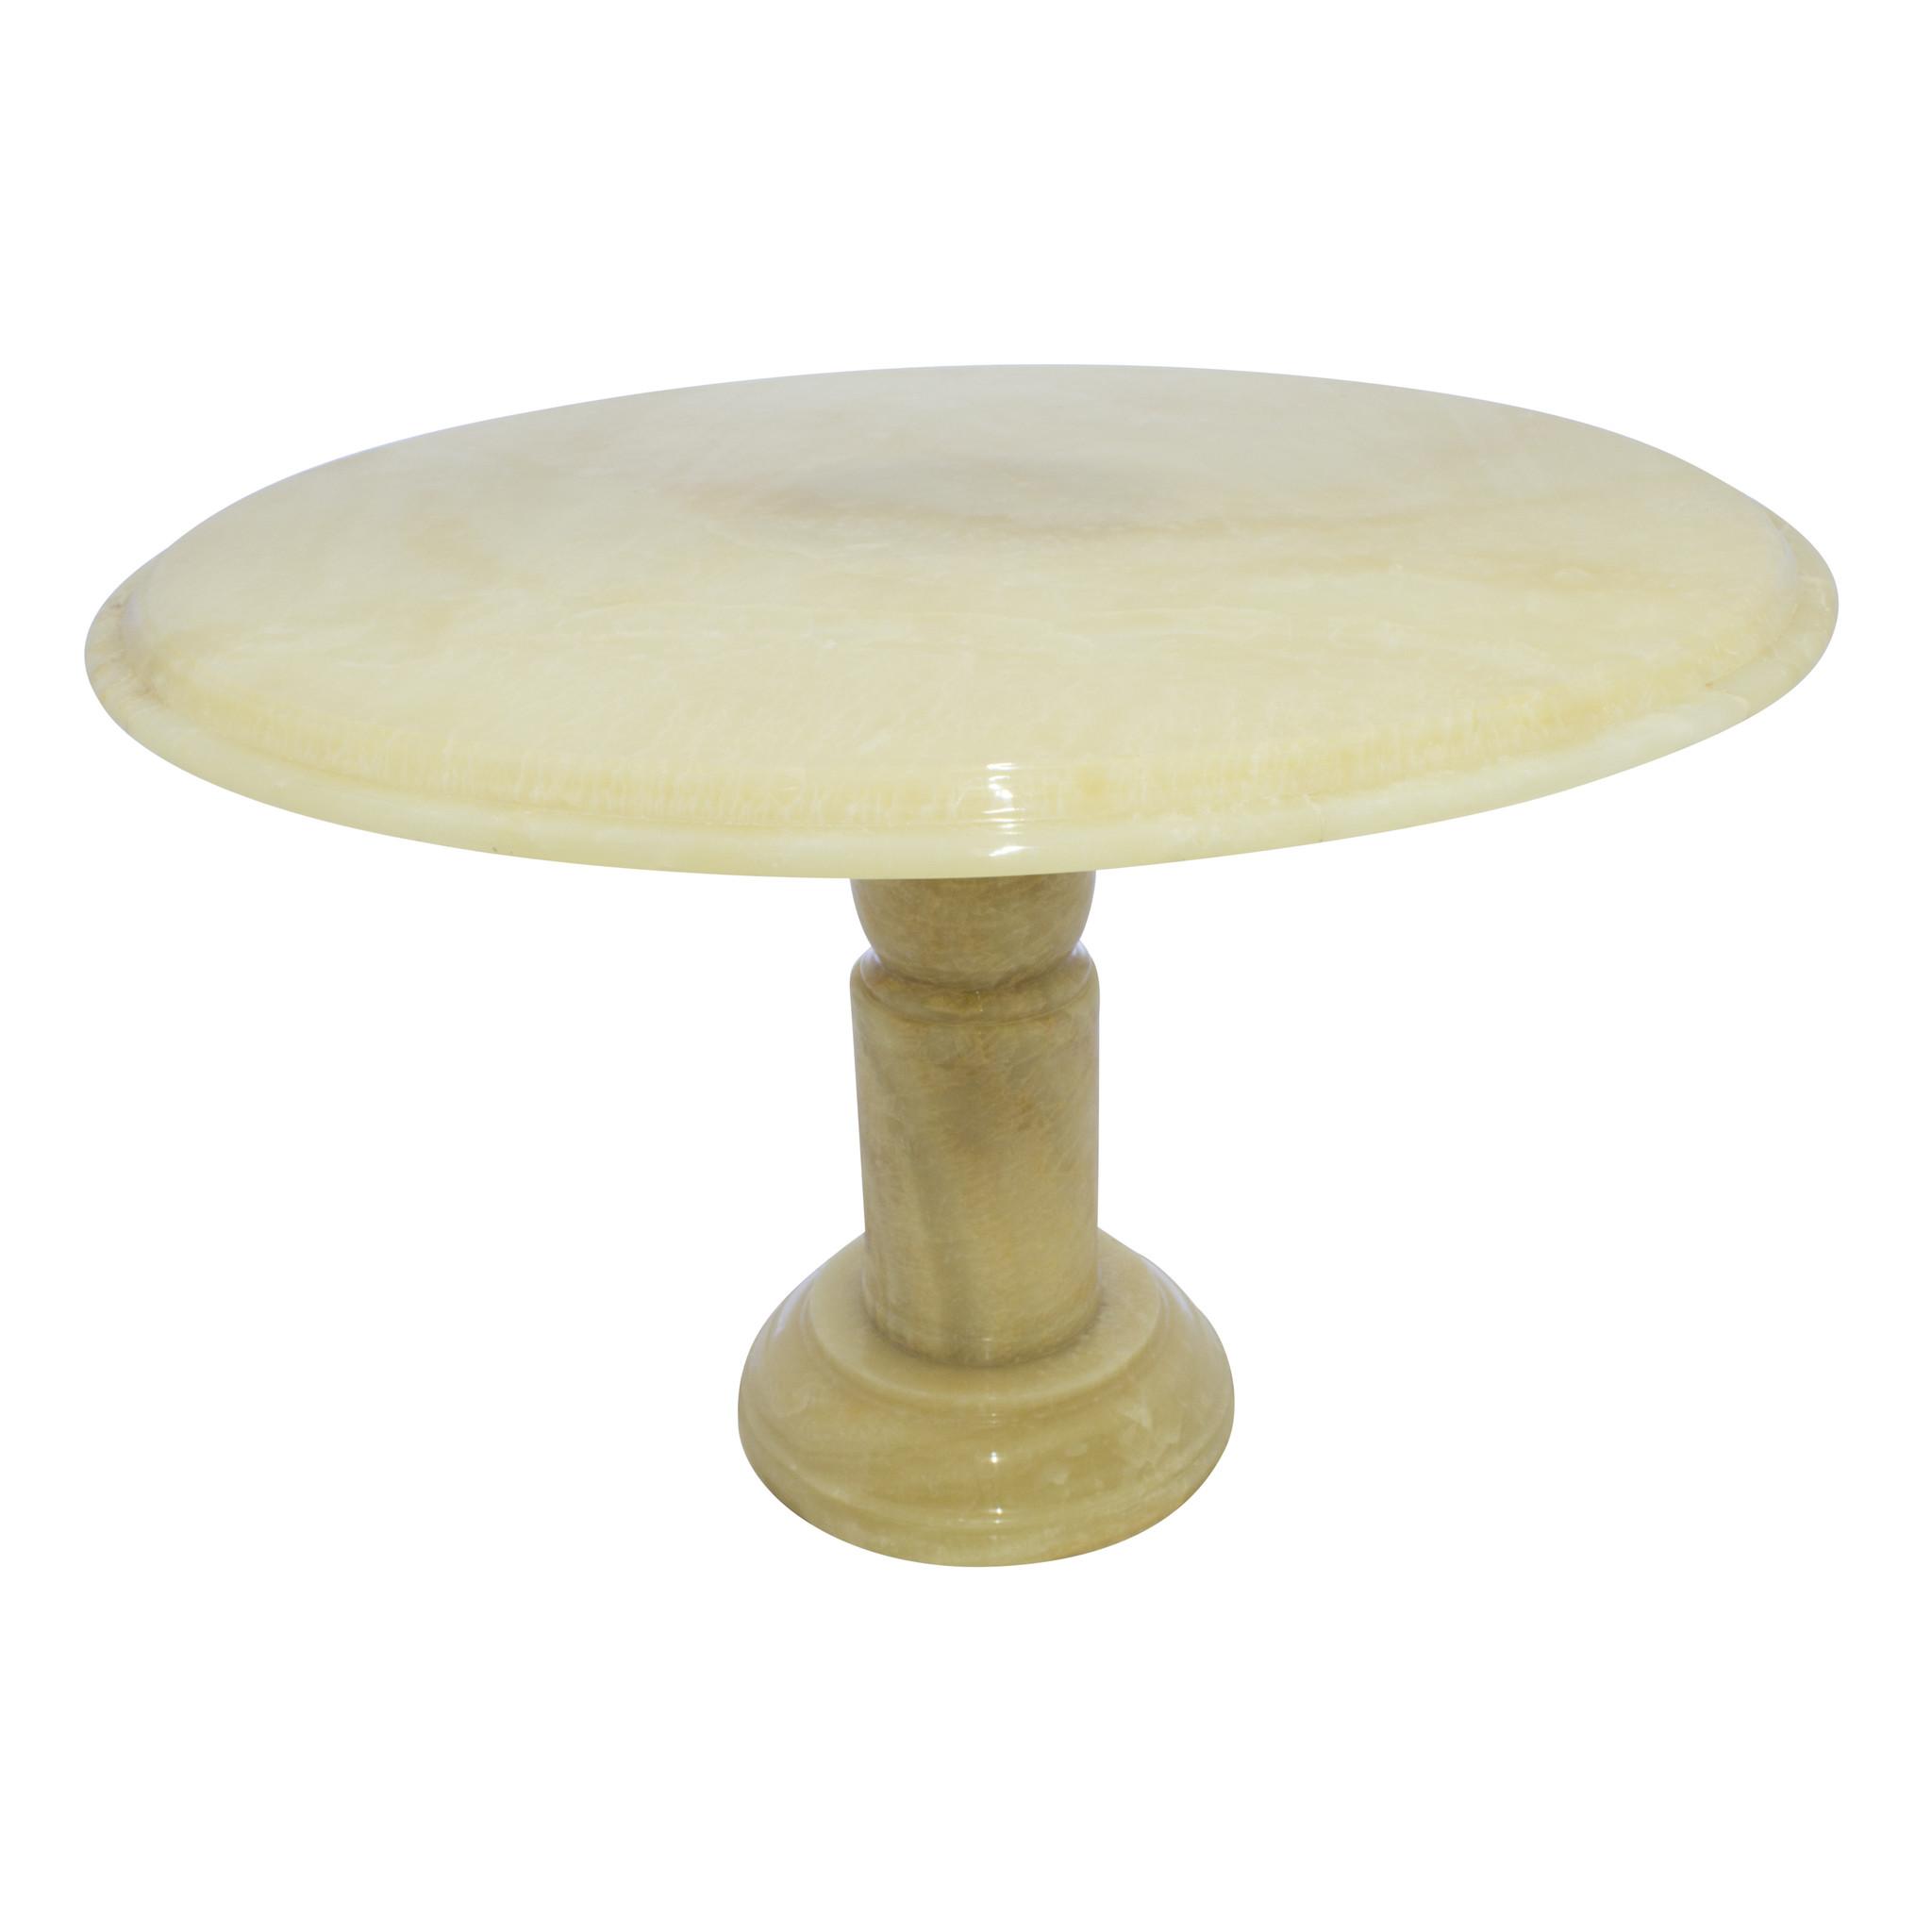 Indomarmer Onyx Dining table Round Ø120xH79 cm